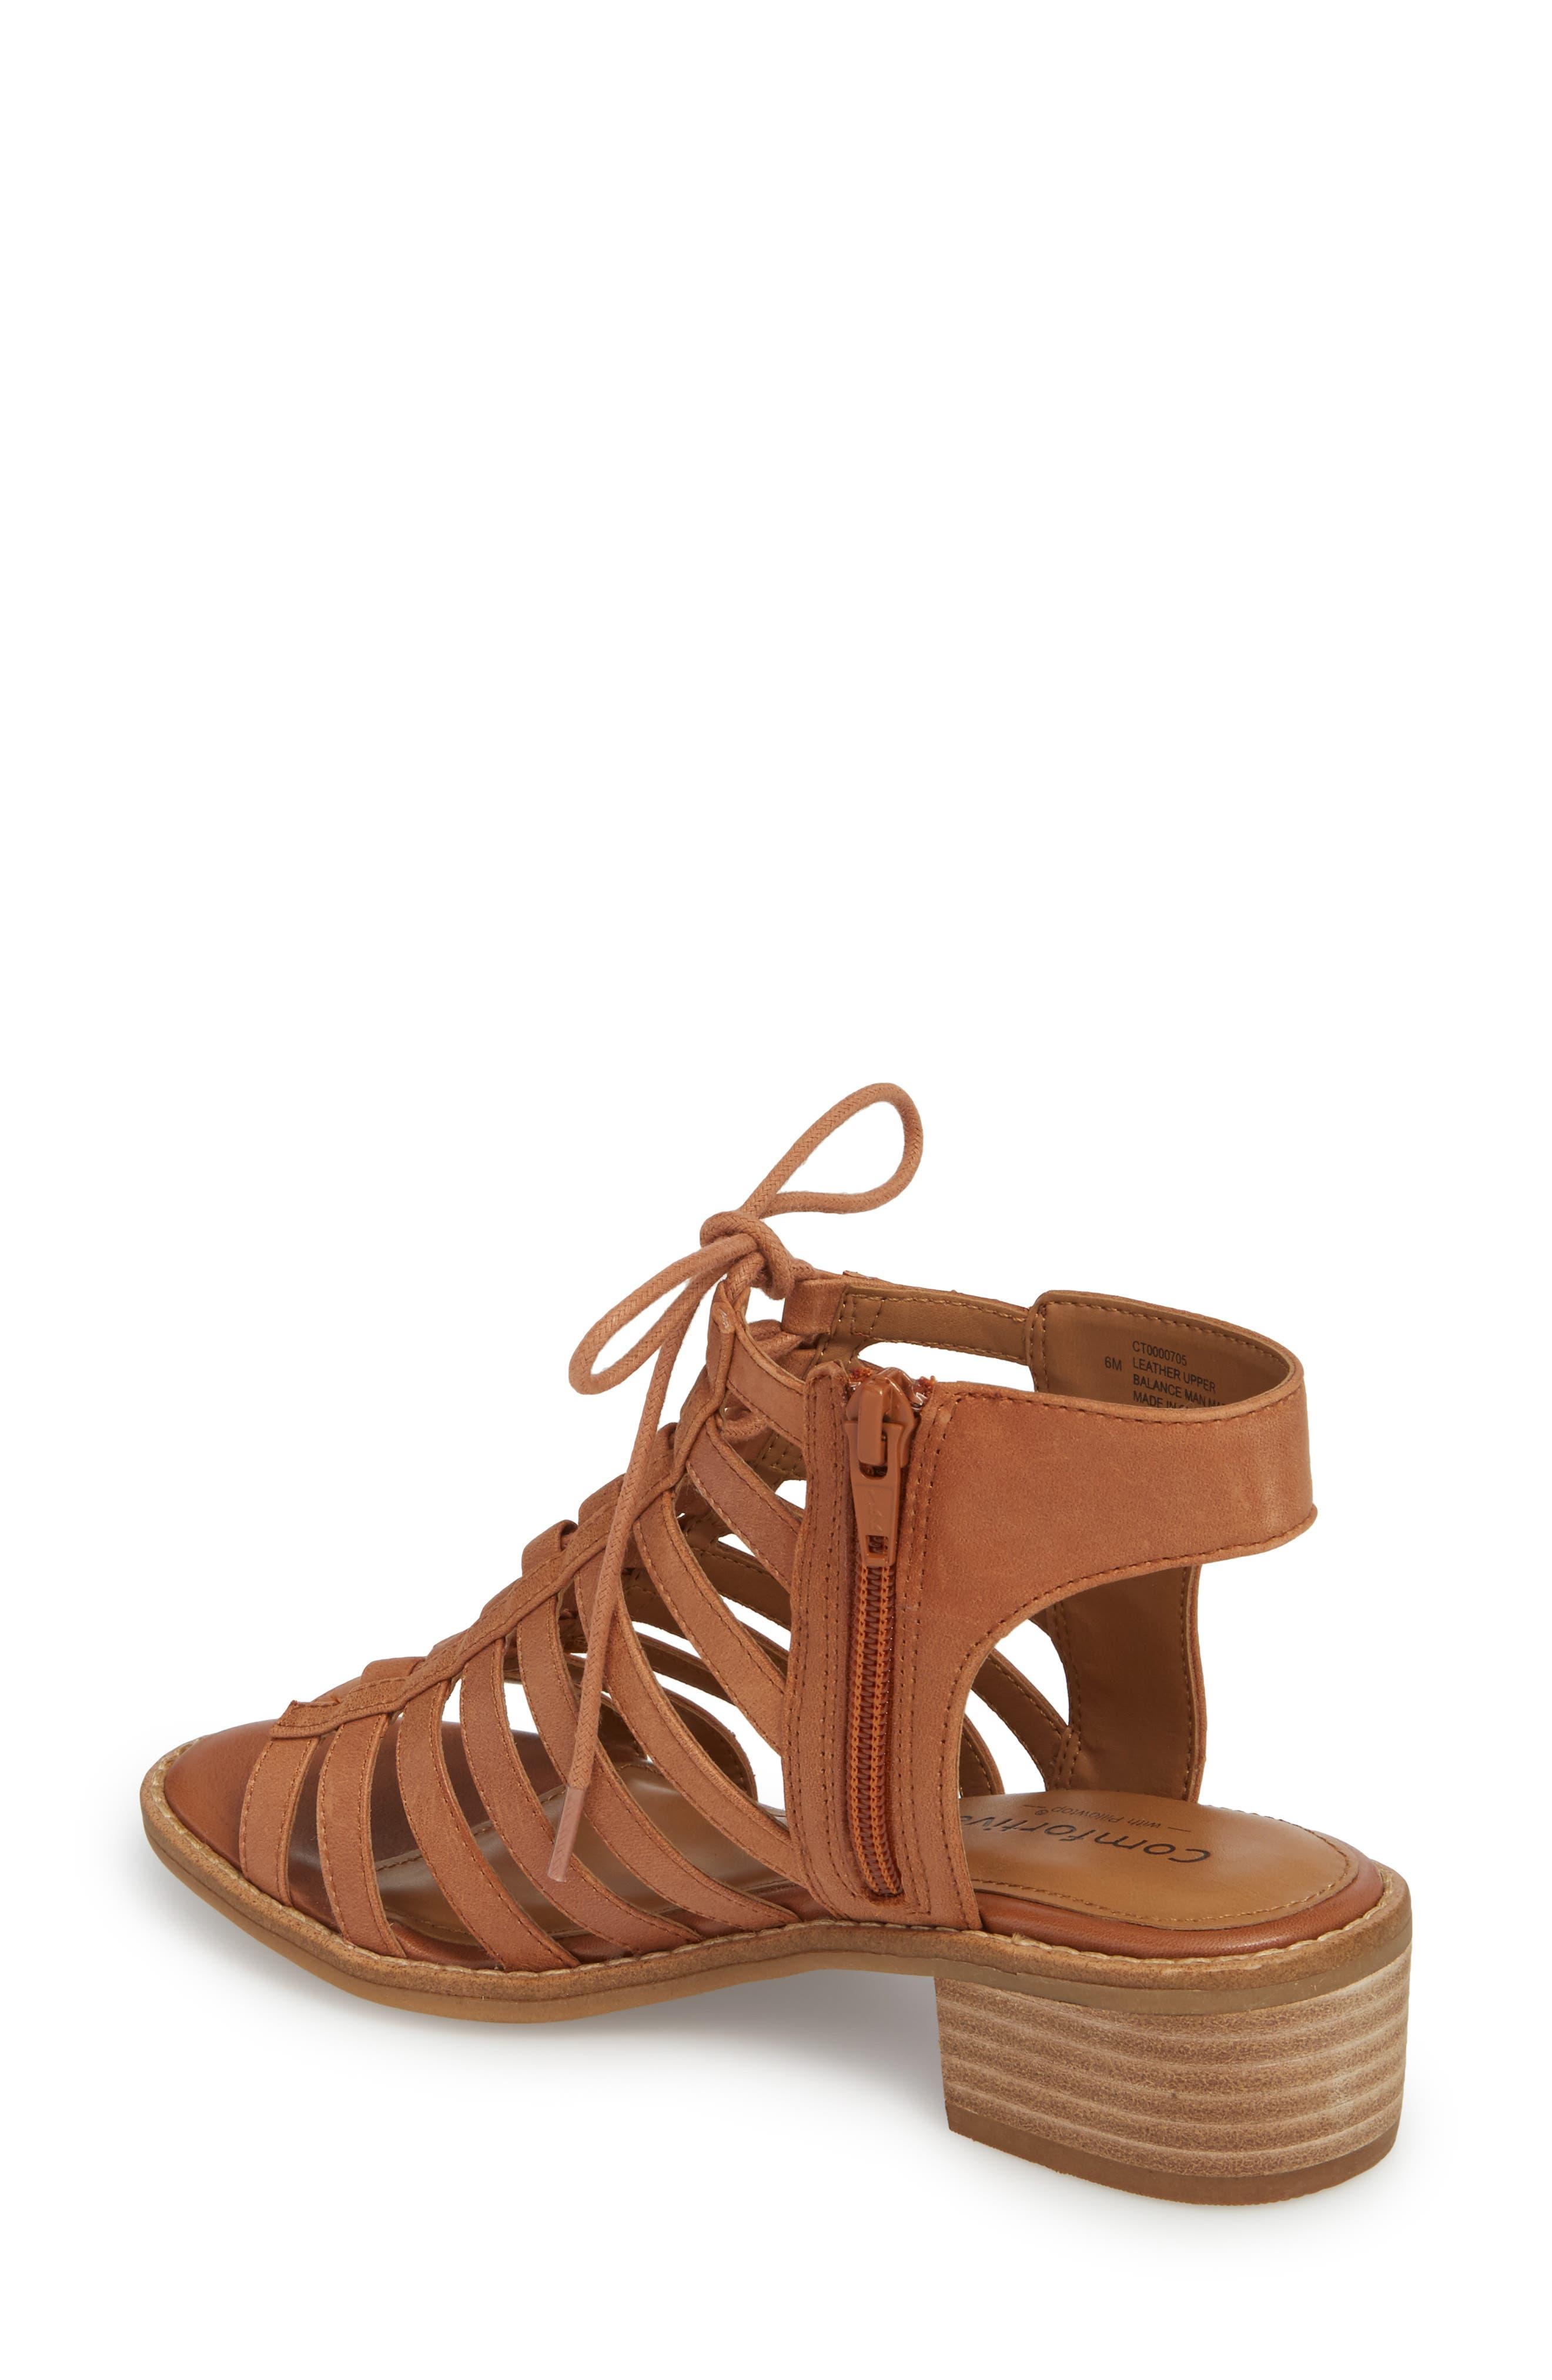 Blossom Sandal,                             Alternate thumbnail 2, color,                             Walnut Leather